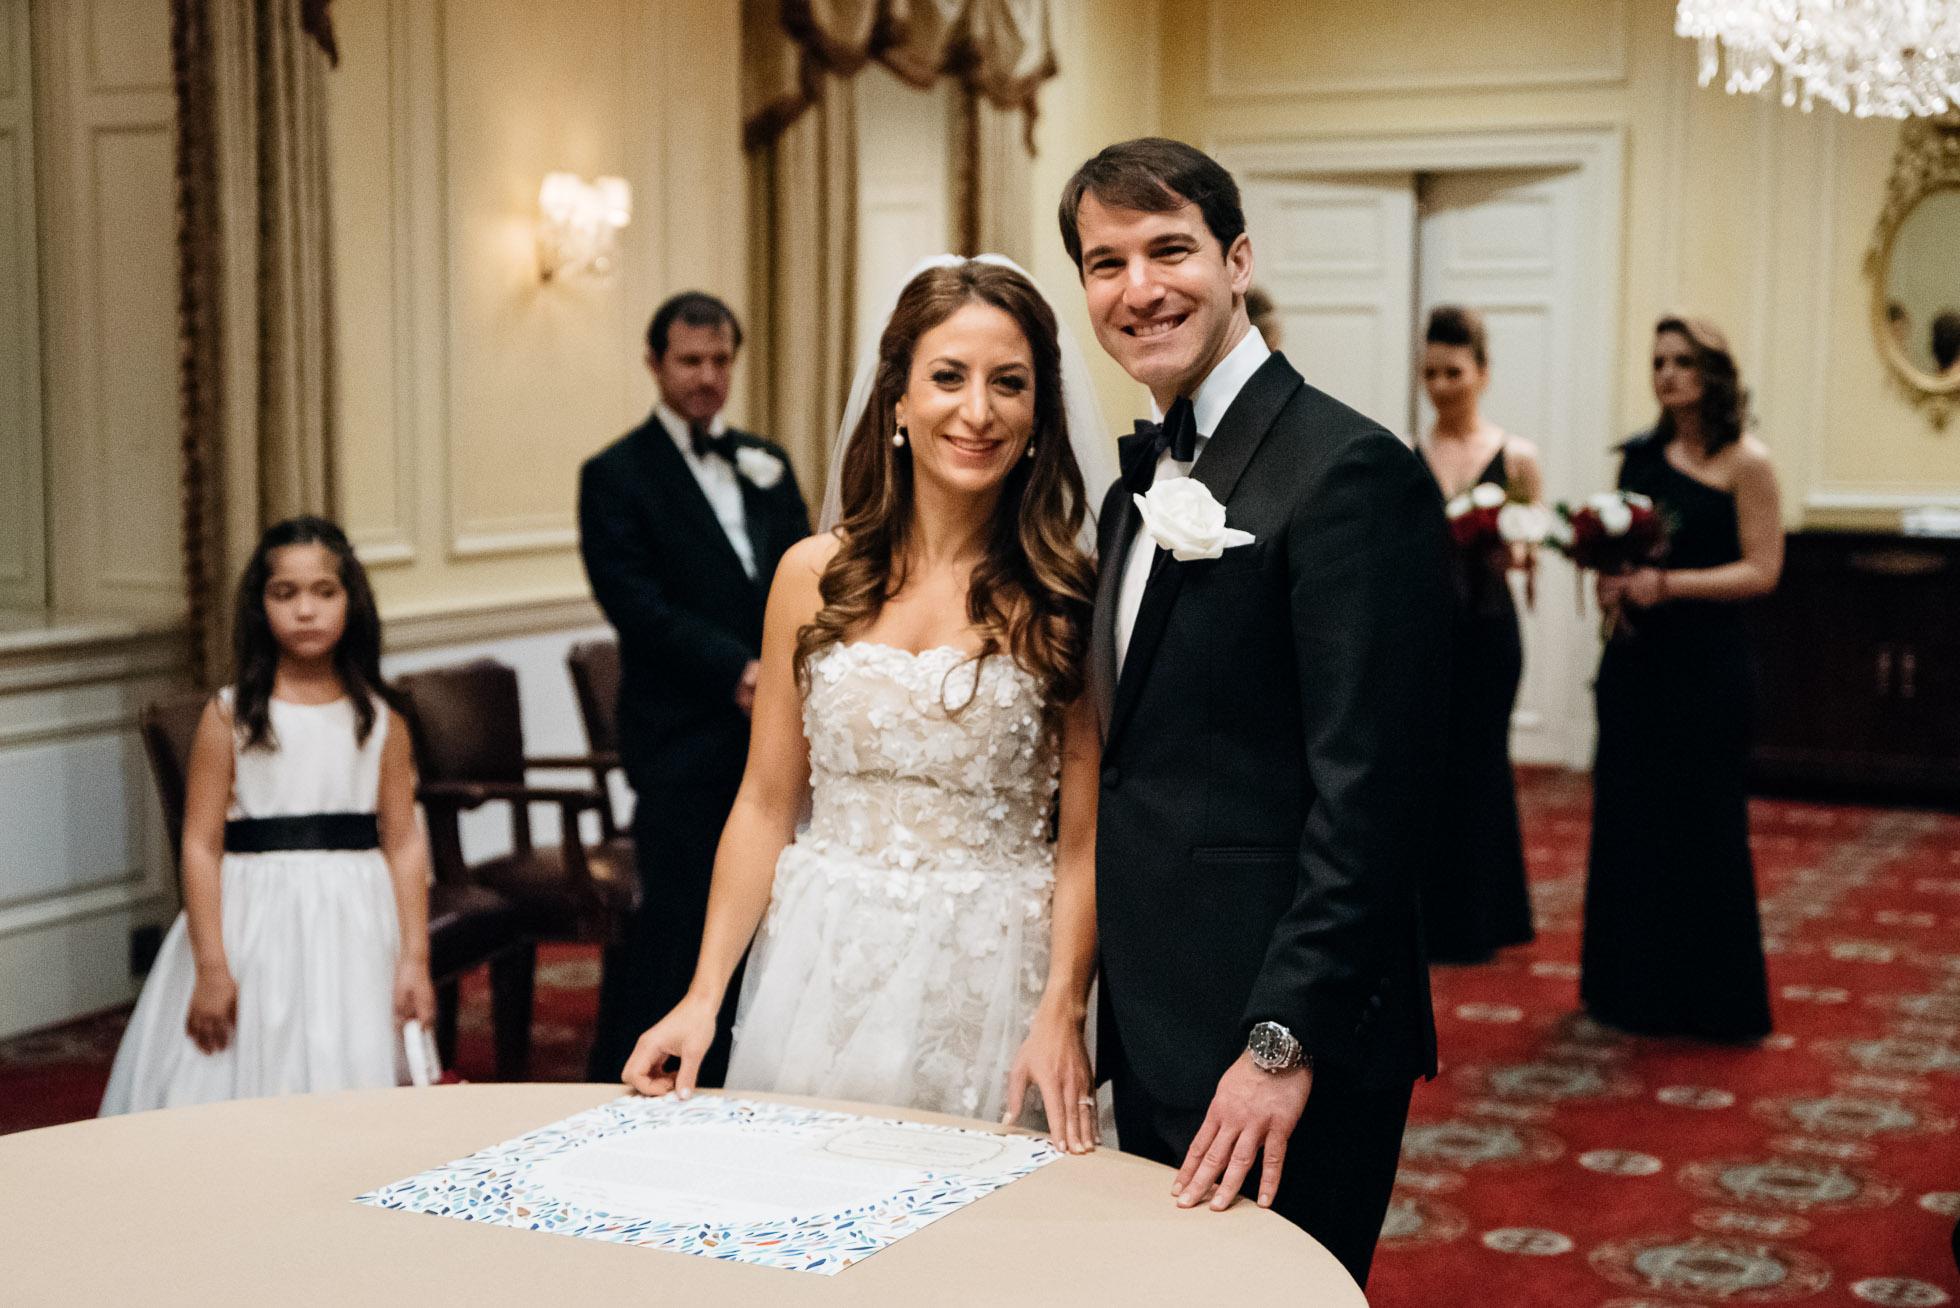 ketuba signing, jewish wedding Pittsburgh PA wedding photographer, duquesne club wedding-1.jpg